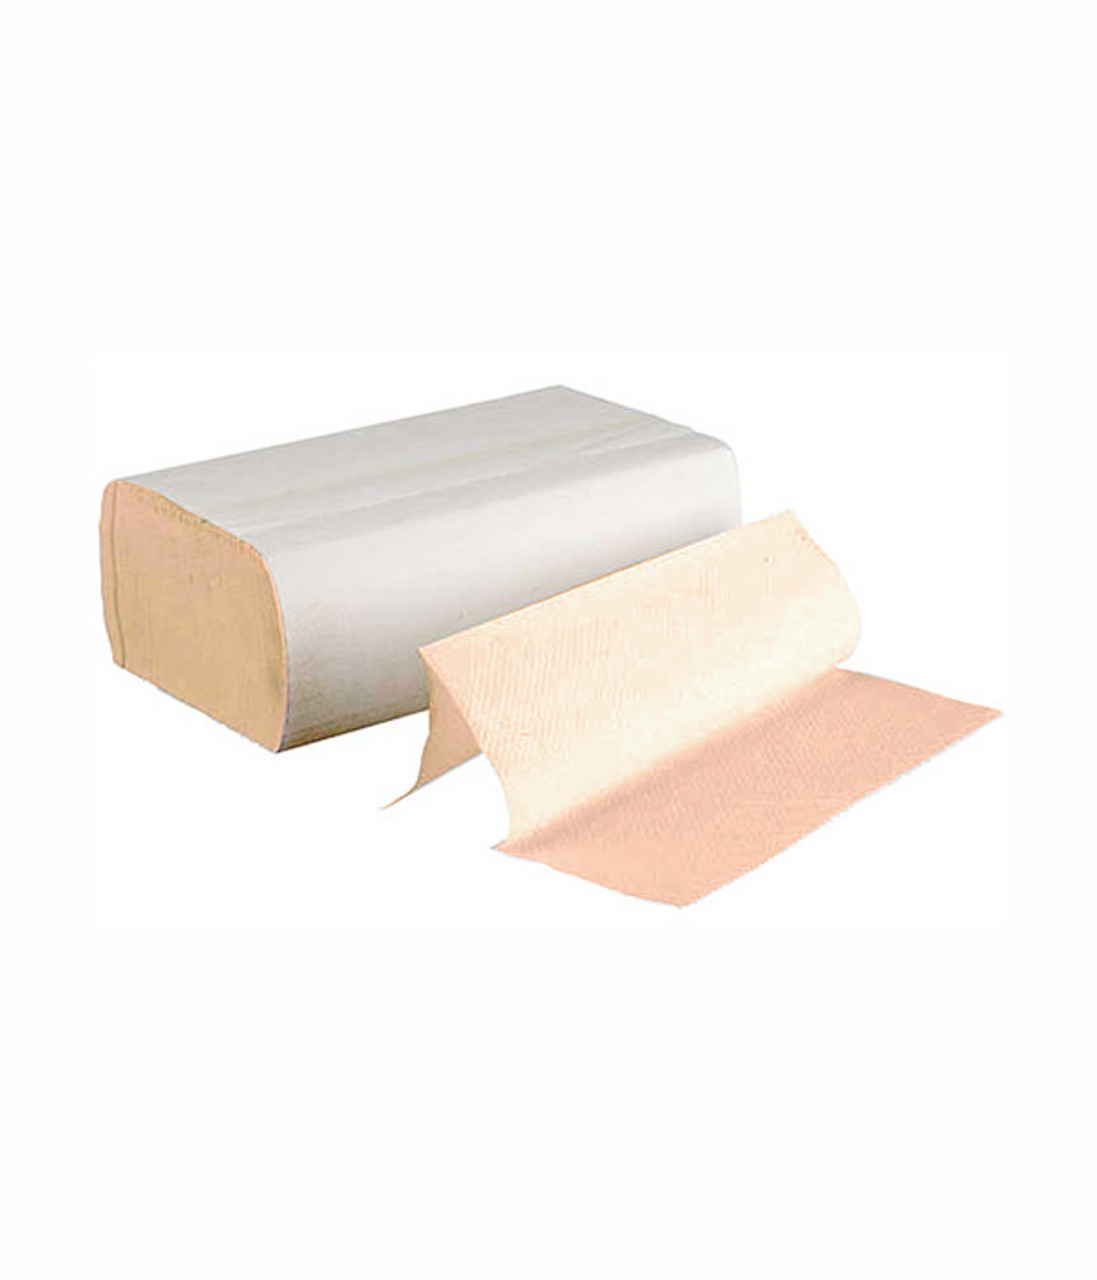 Value Price Multi Fold Paper Towels in Kraft